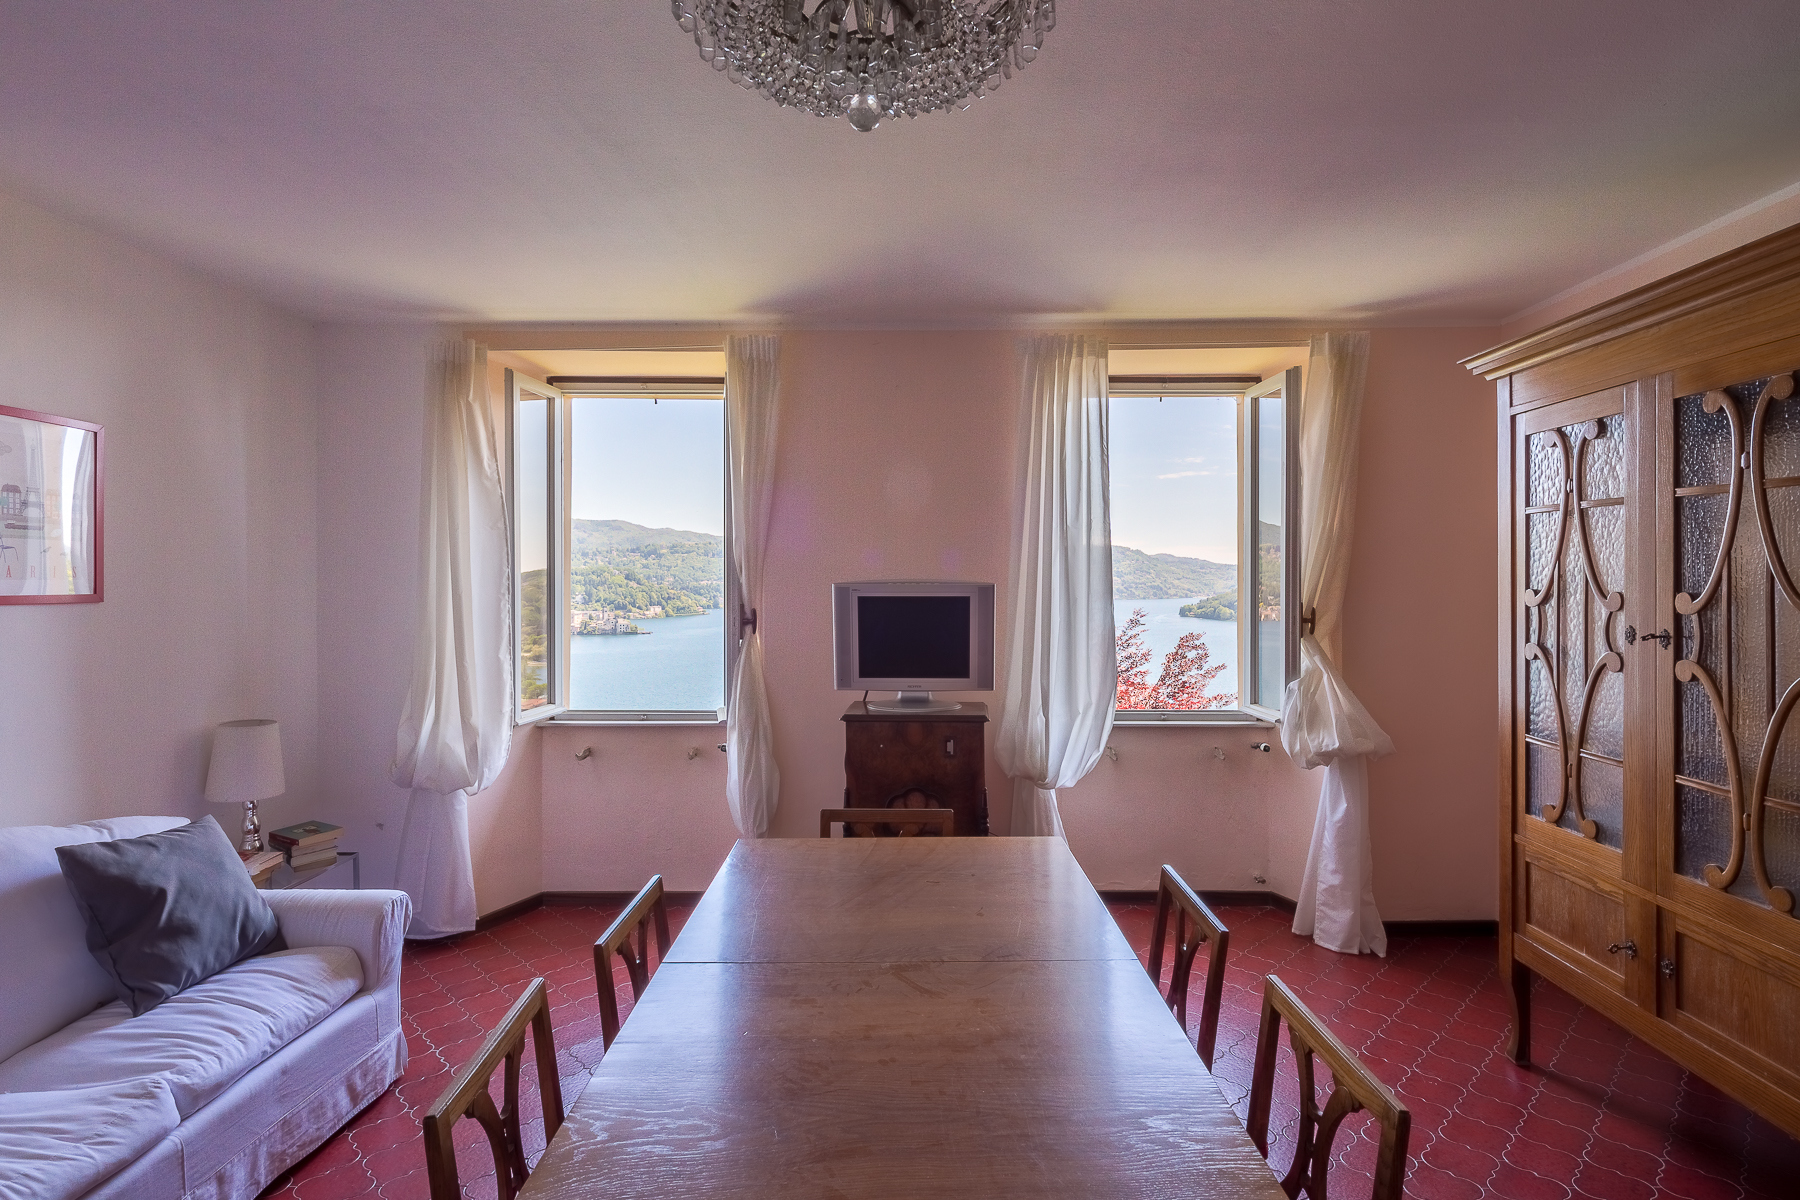 Casa indipendente in Vendita a Pella: 5 locali, 292 mq - Foto 4